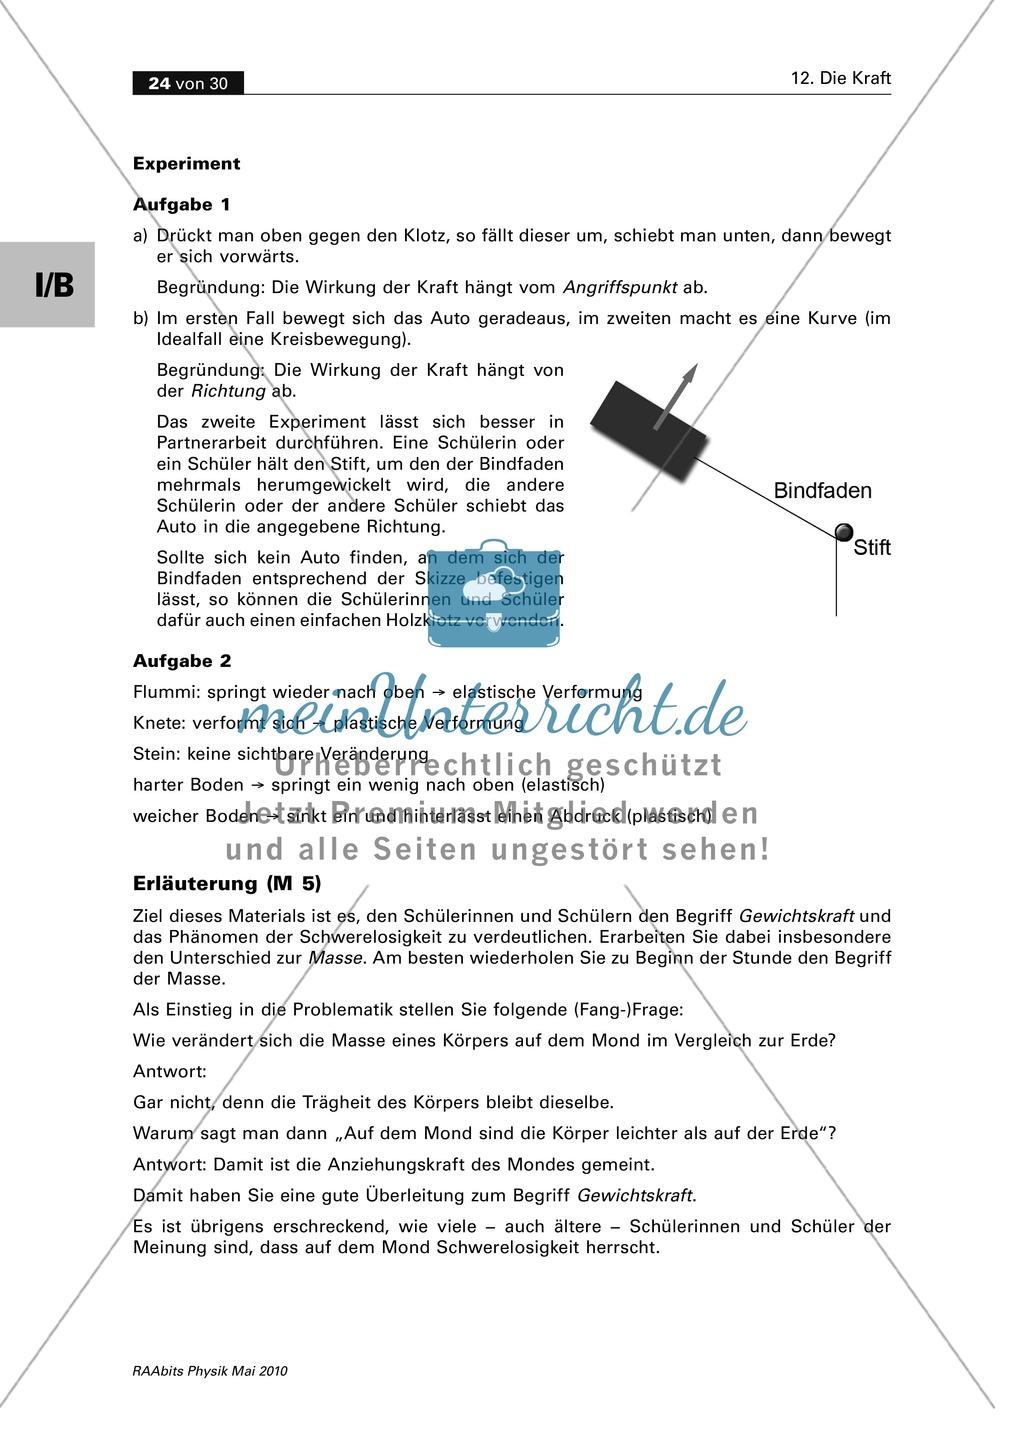 Gemütlich Folgende Richtung Arbeitsblatt Ideen - Super Lehrer ...